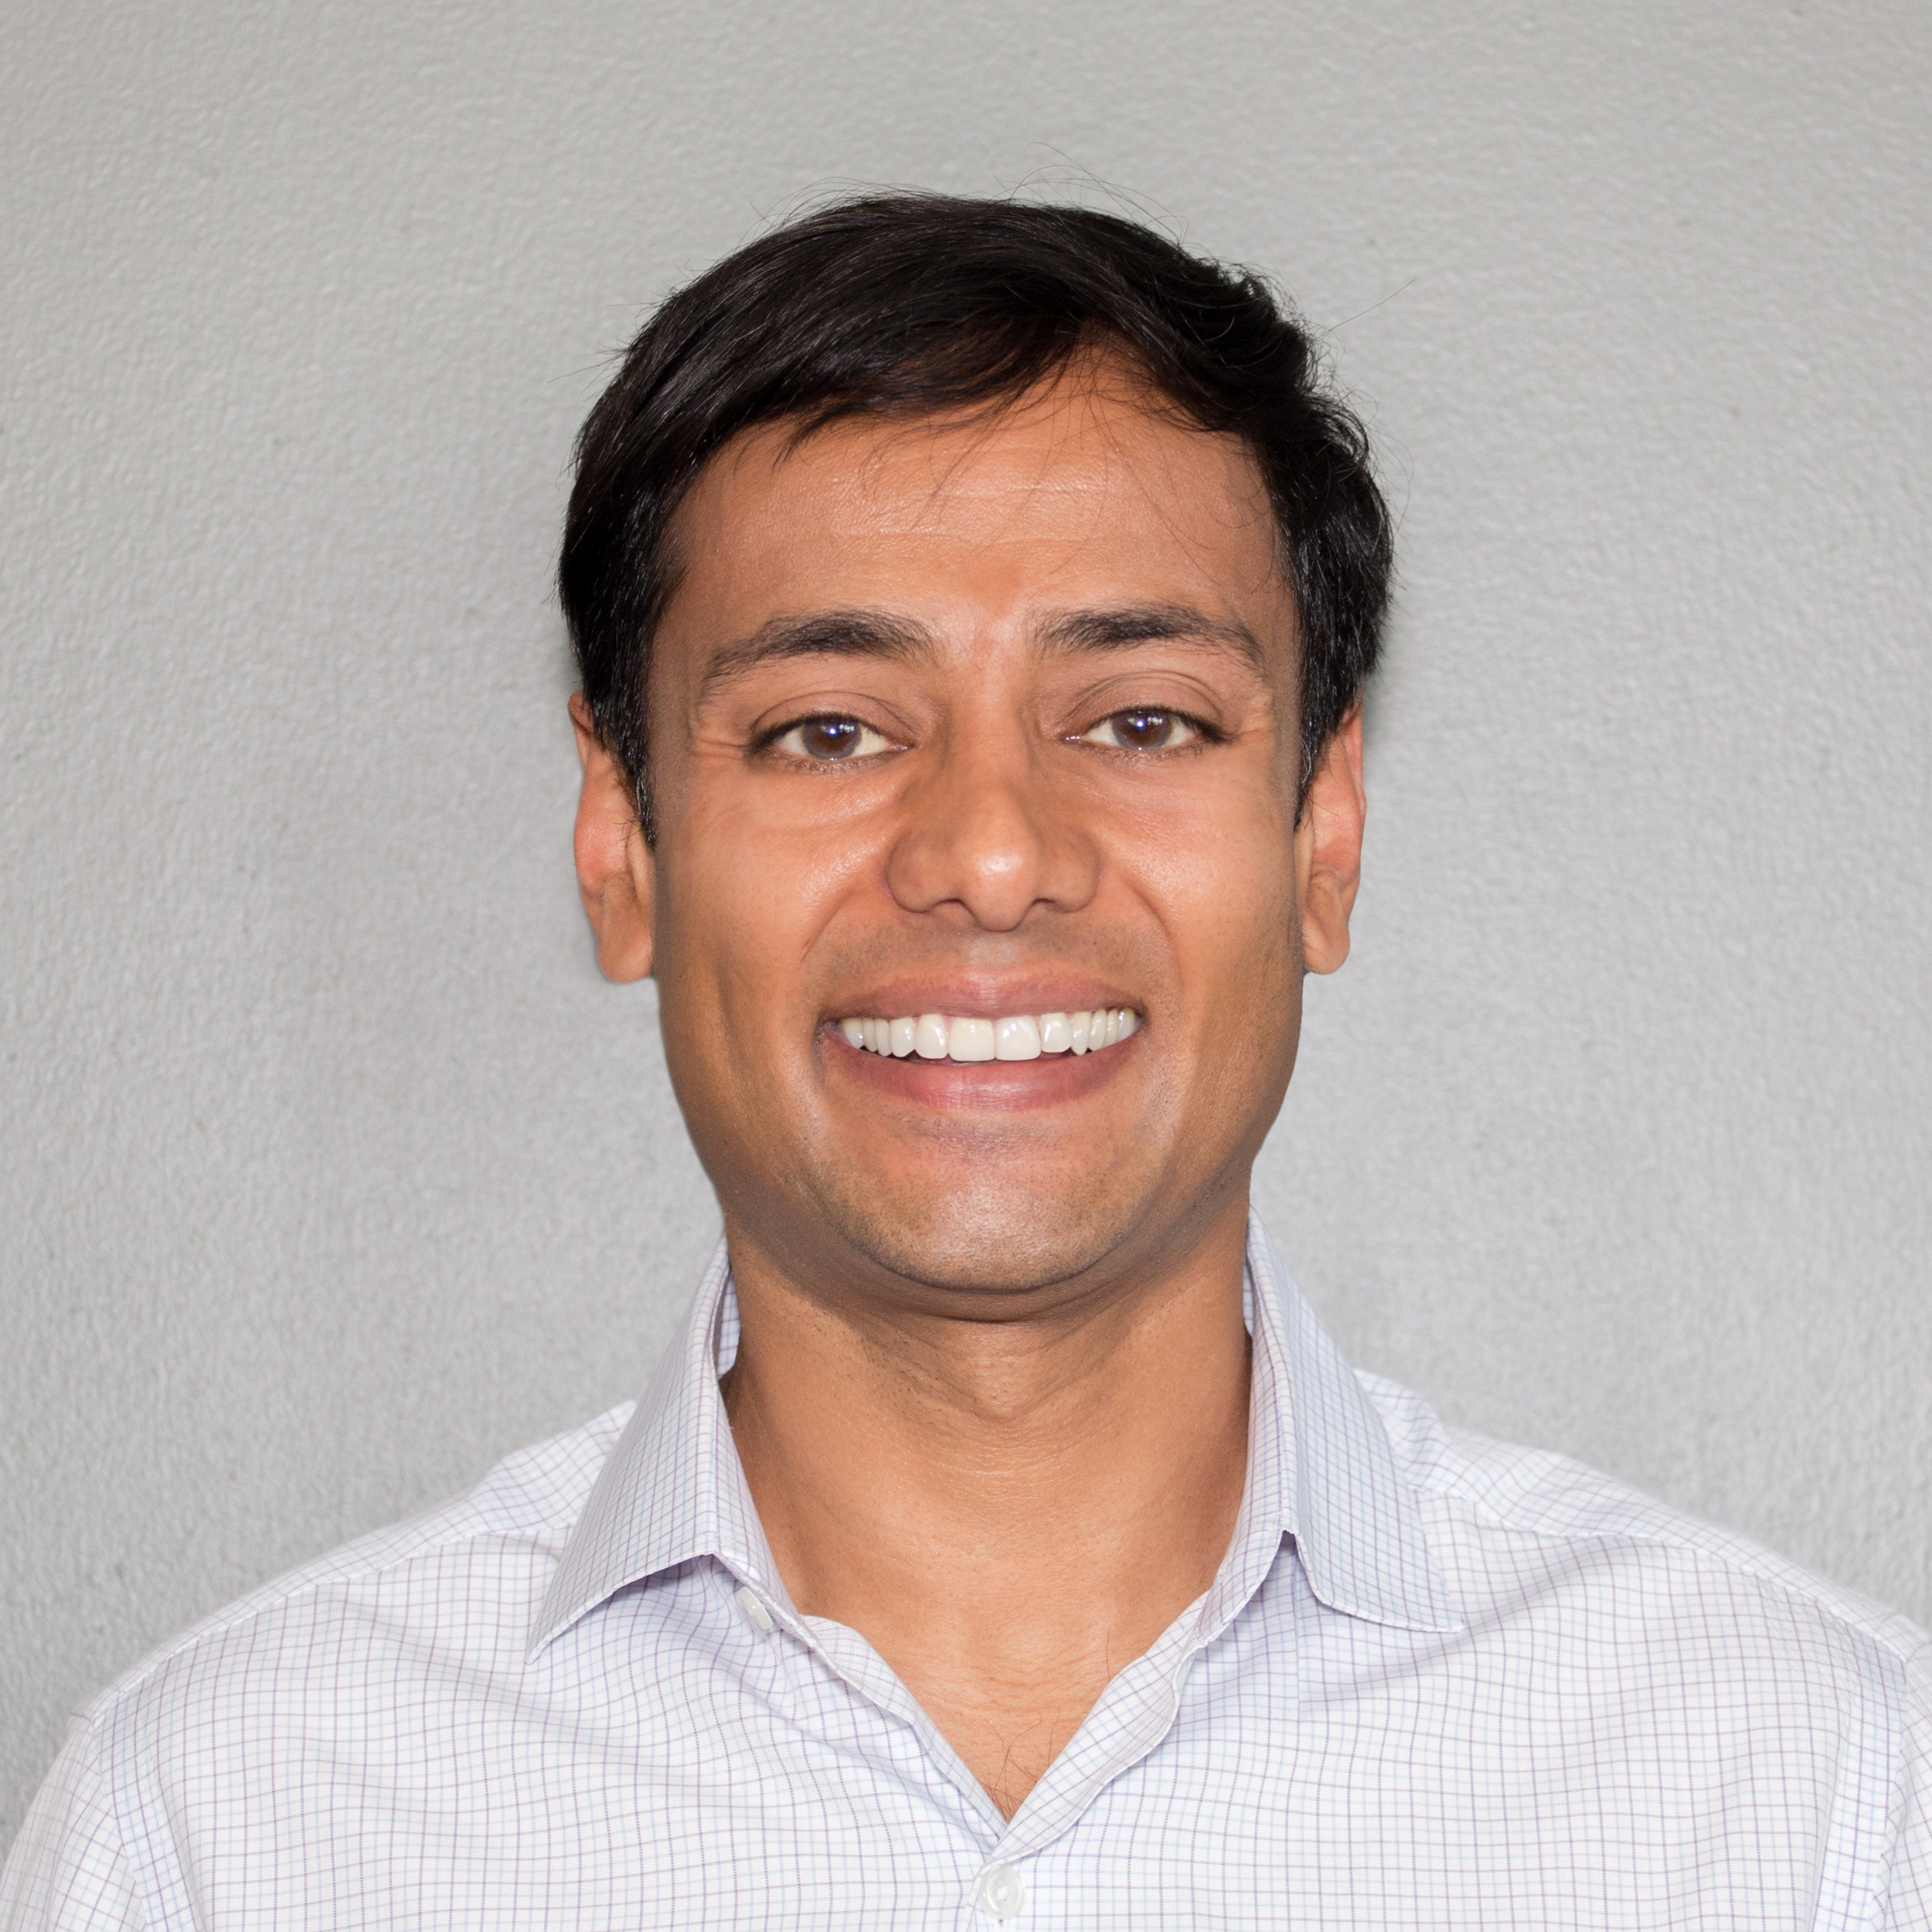 Mehul patel resume best dissertation methodology ghostwriter website for phd